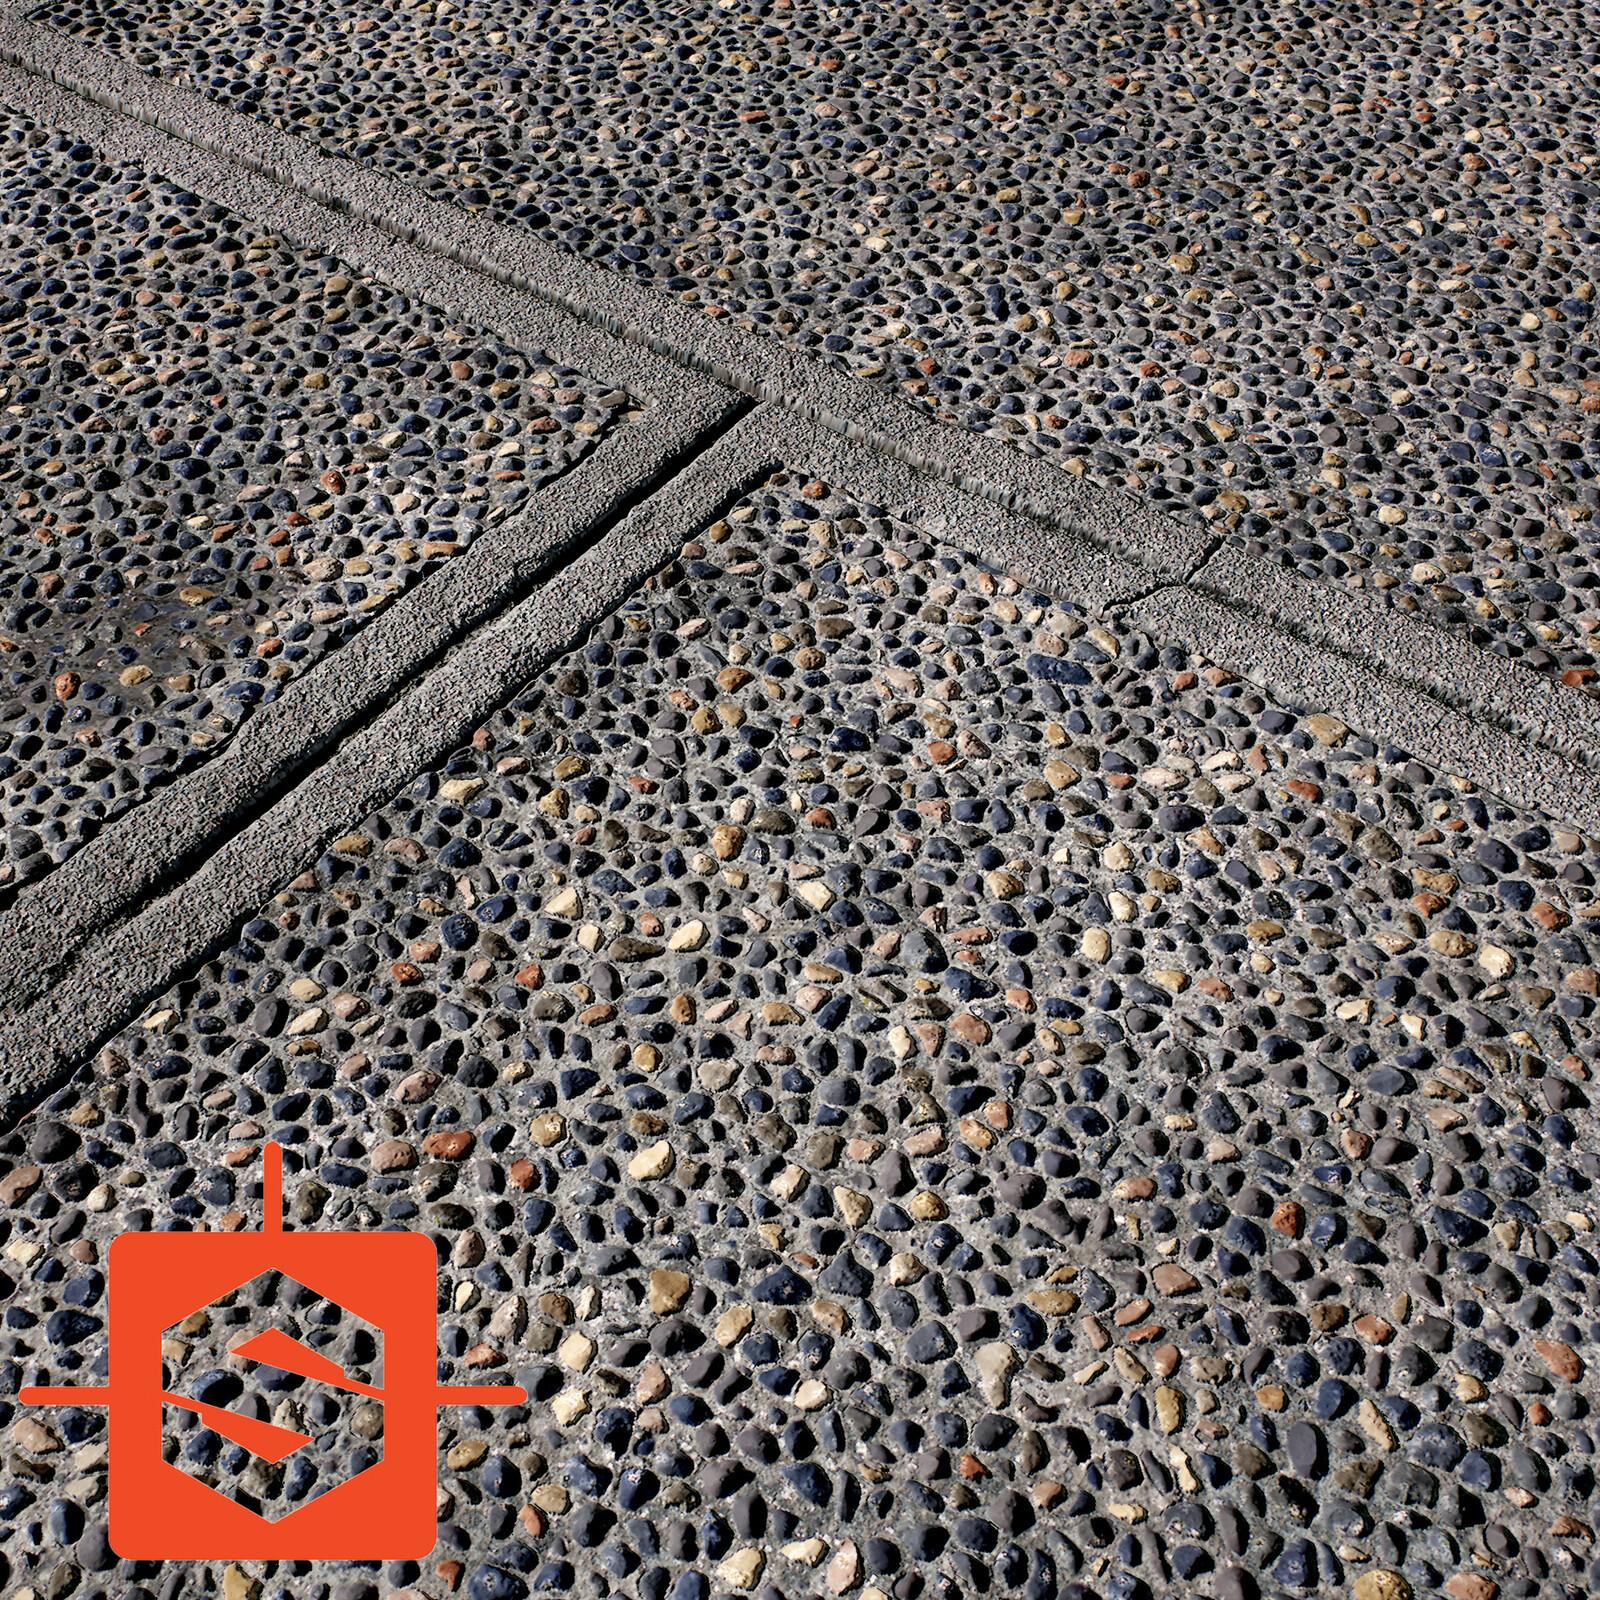 Tiles And Pebbles - 100% Substance Designer